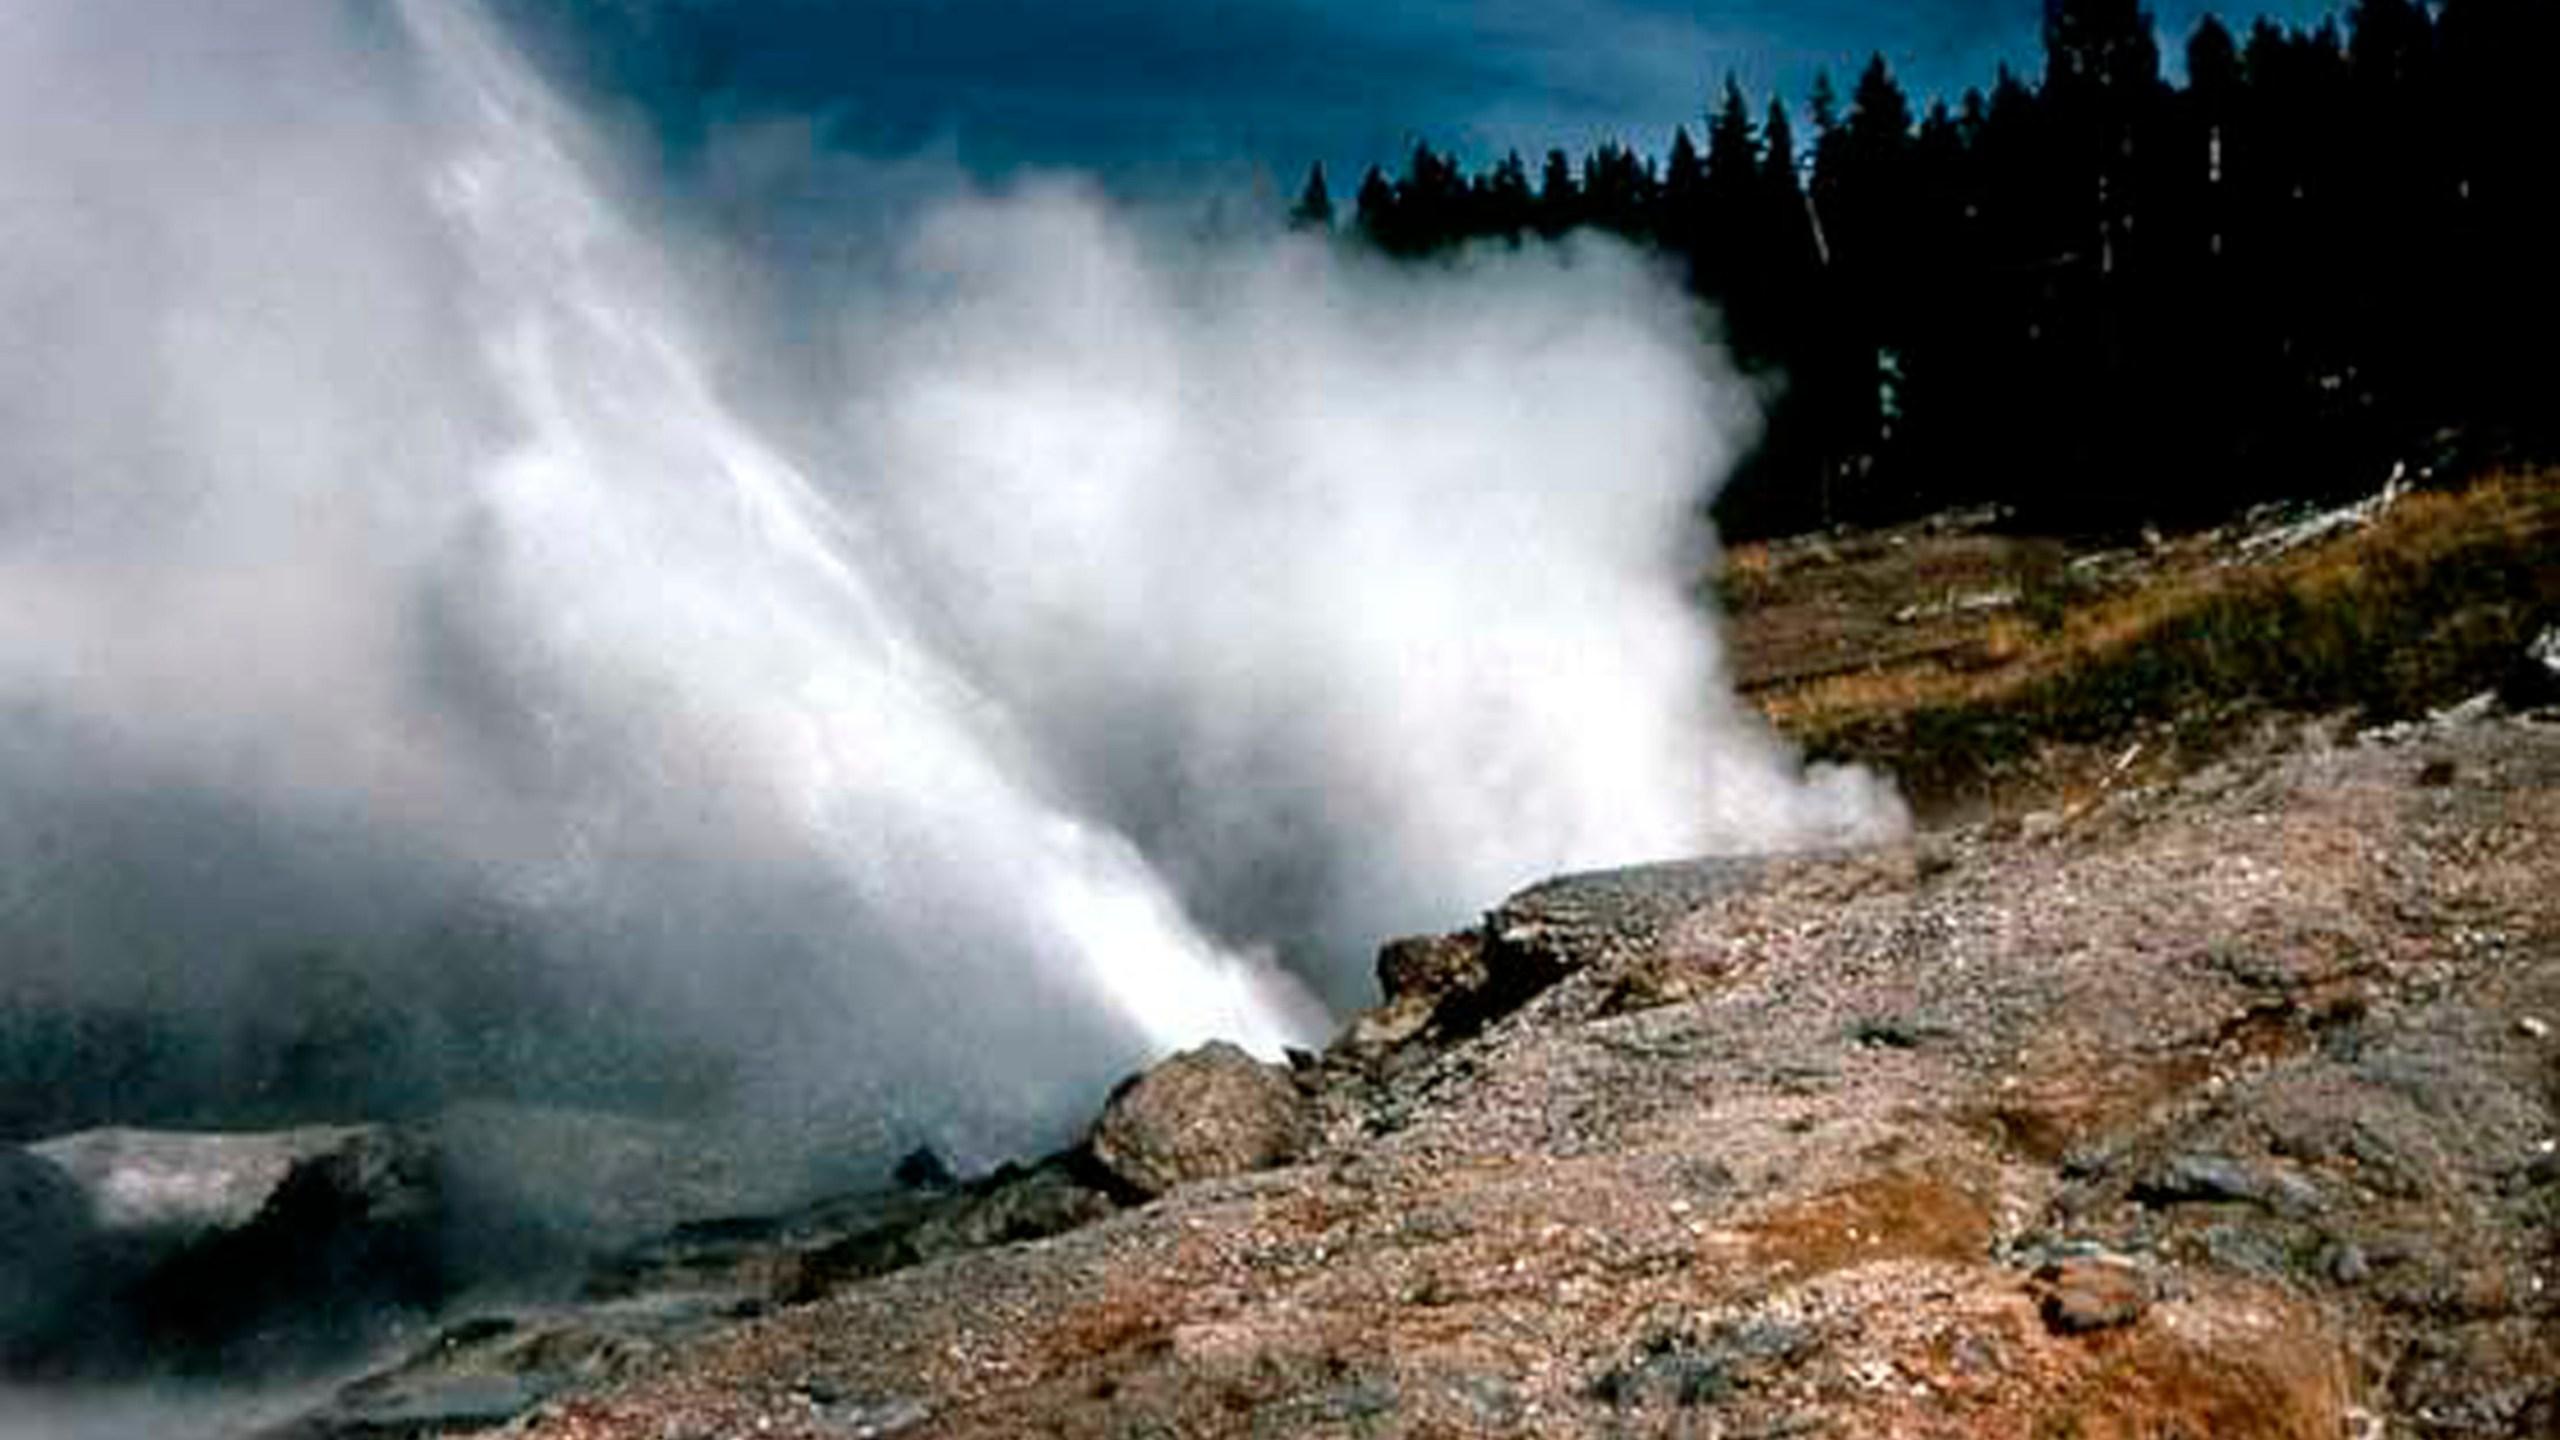 Yellowstone_Geyser_94675-159532.jpg45196763